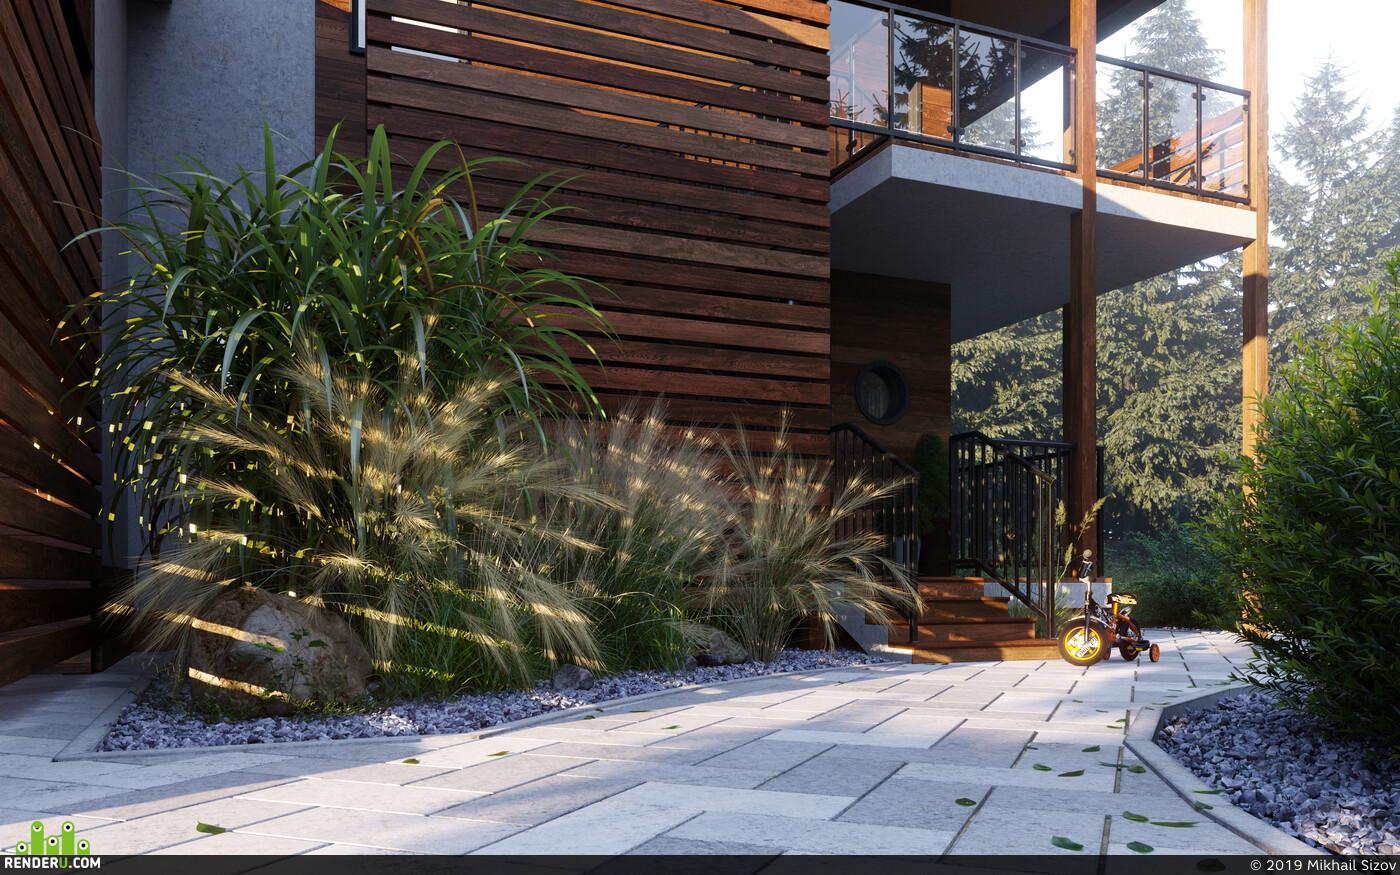 Architectural 3D Visualization, Exterior 3d visualization Corona Renderer corona 1.7 coronarenderer, RENDER 3D VISUALIZATION, visualisation, interior interior design design 3D 3D Studio Max 3D архитектура интерьер дизайн интерьера интерьер, visualization, Architectural3Dvisualizer, exterior visualization